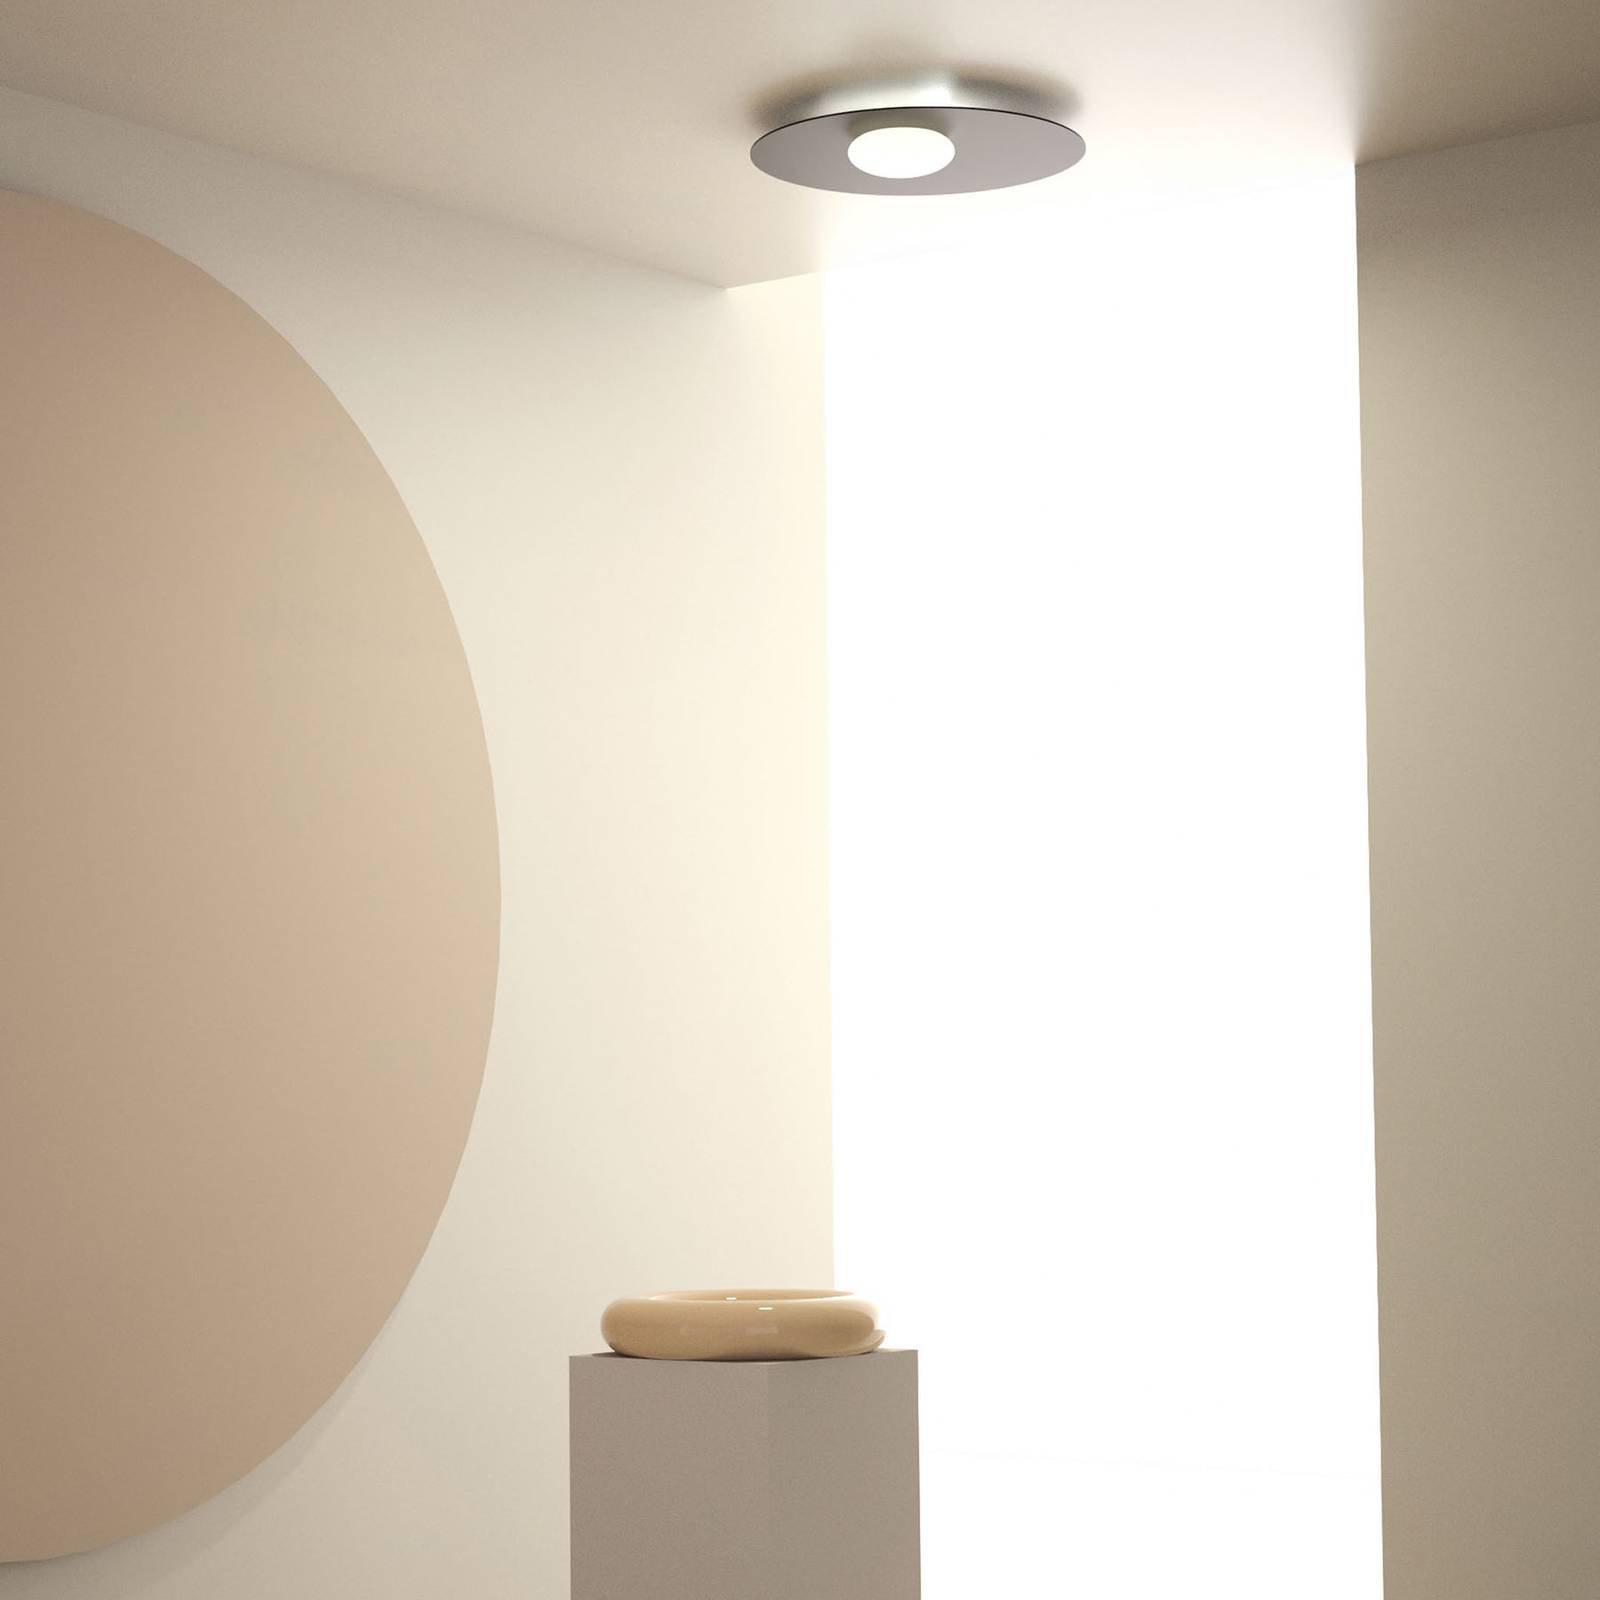 Axolight Kwic LED-taklampe, svart Ø 48 cm